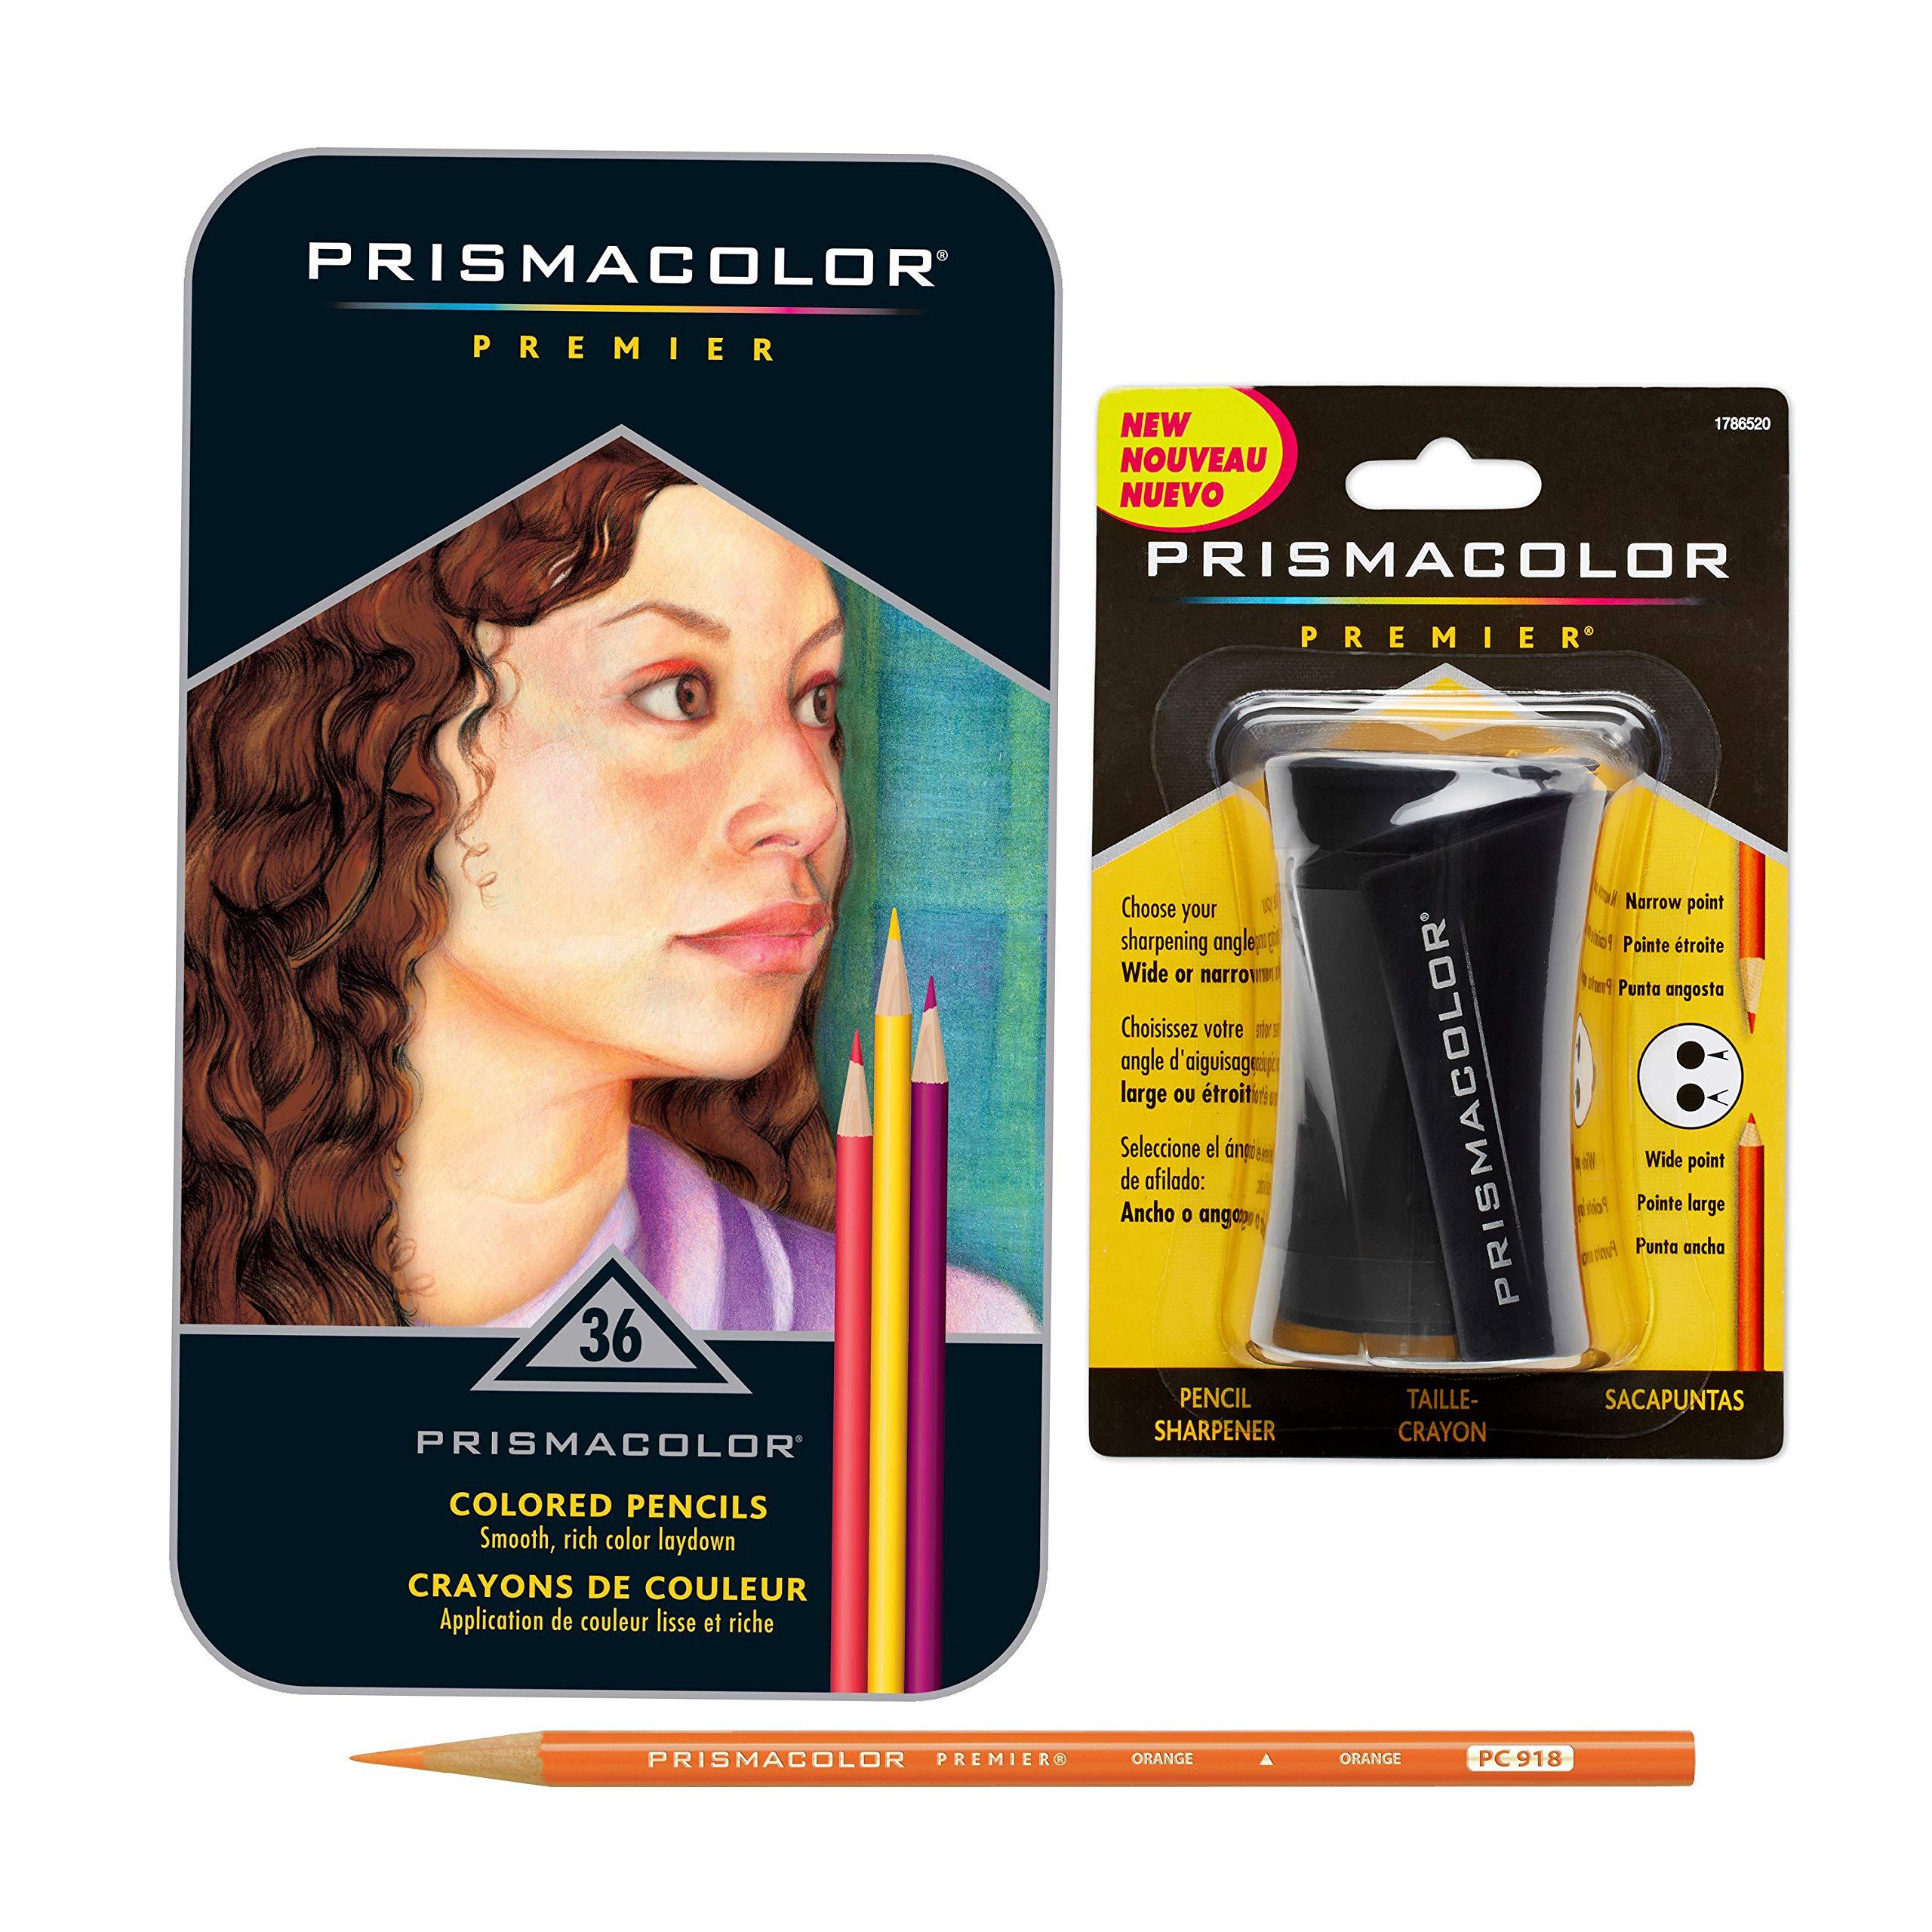 Prismacolor Premier Colored Pencils, Soft Core, 36 Pack with Pencil Sharpener